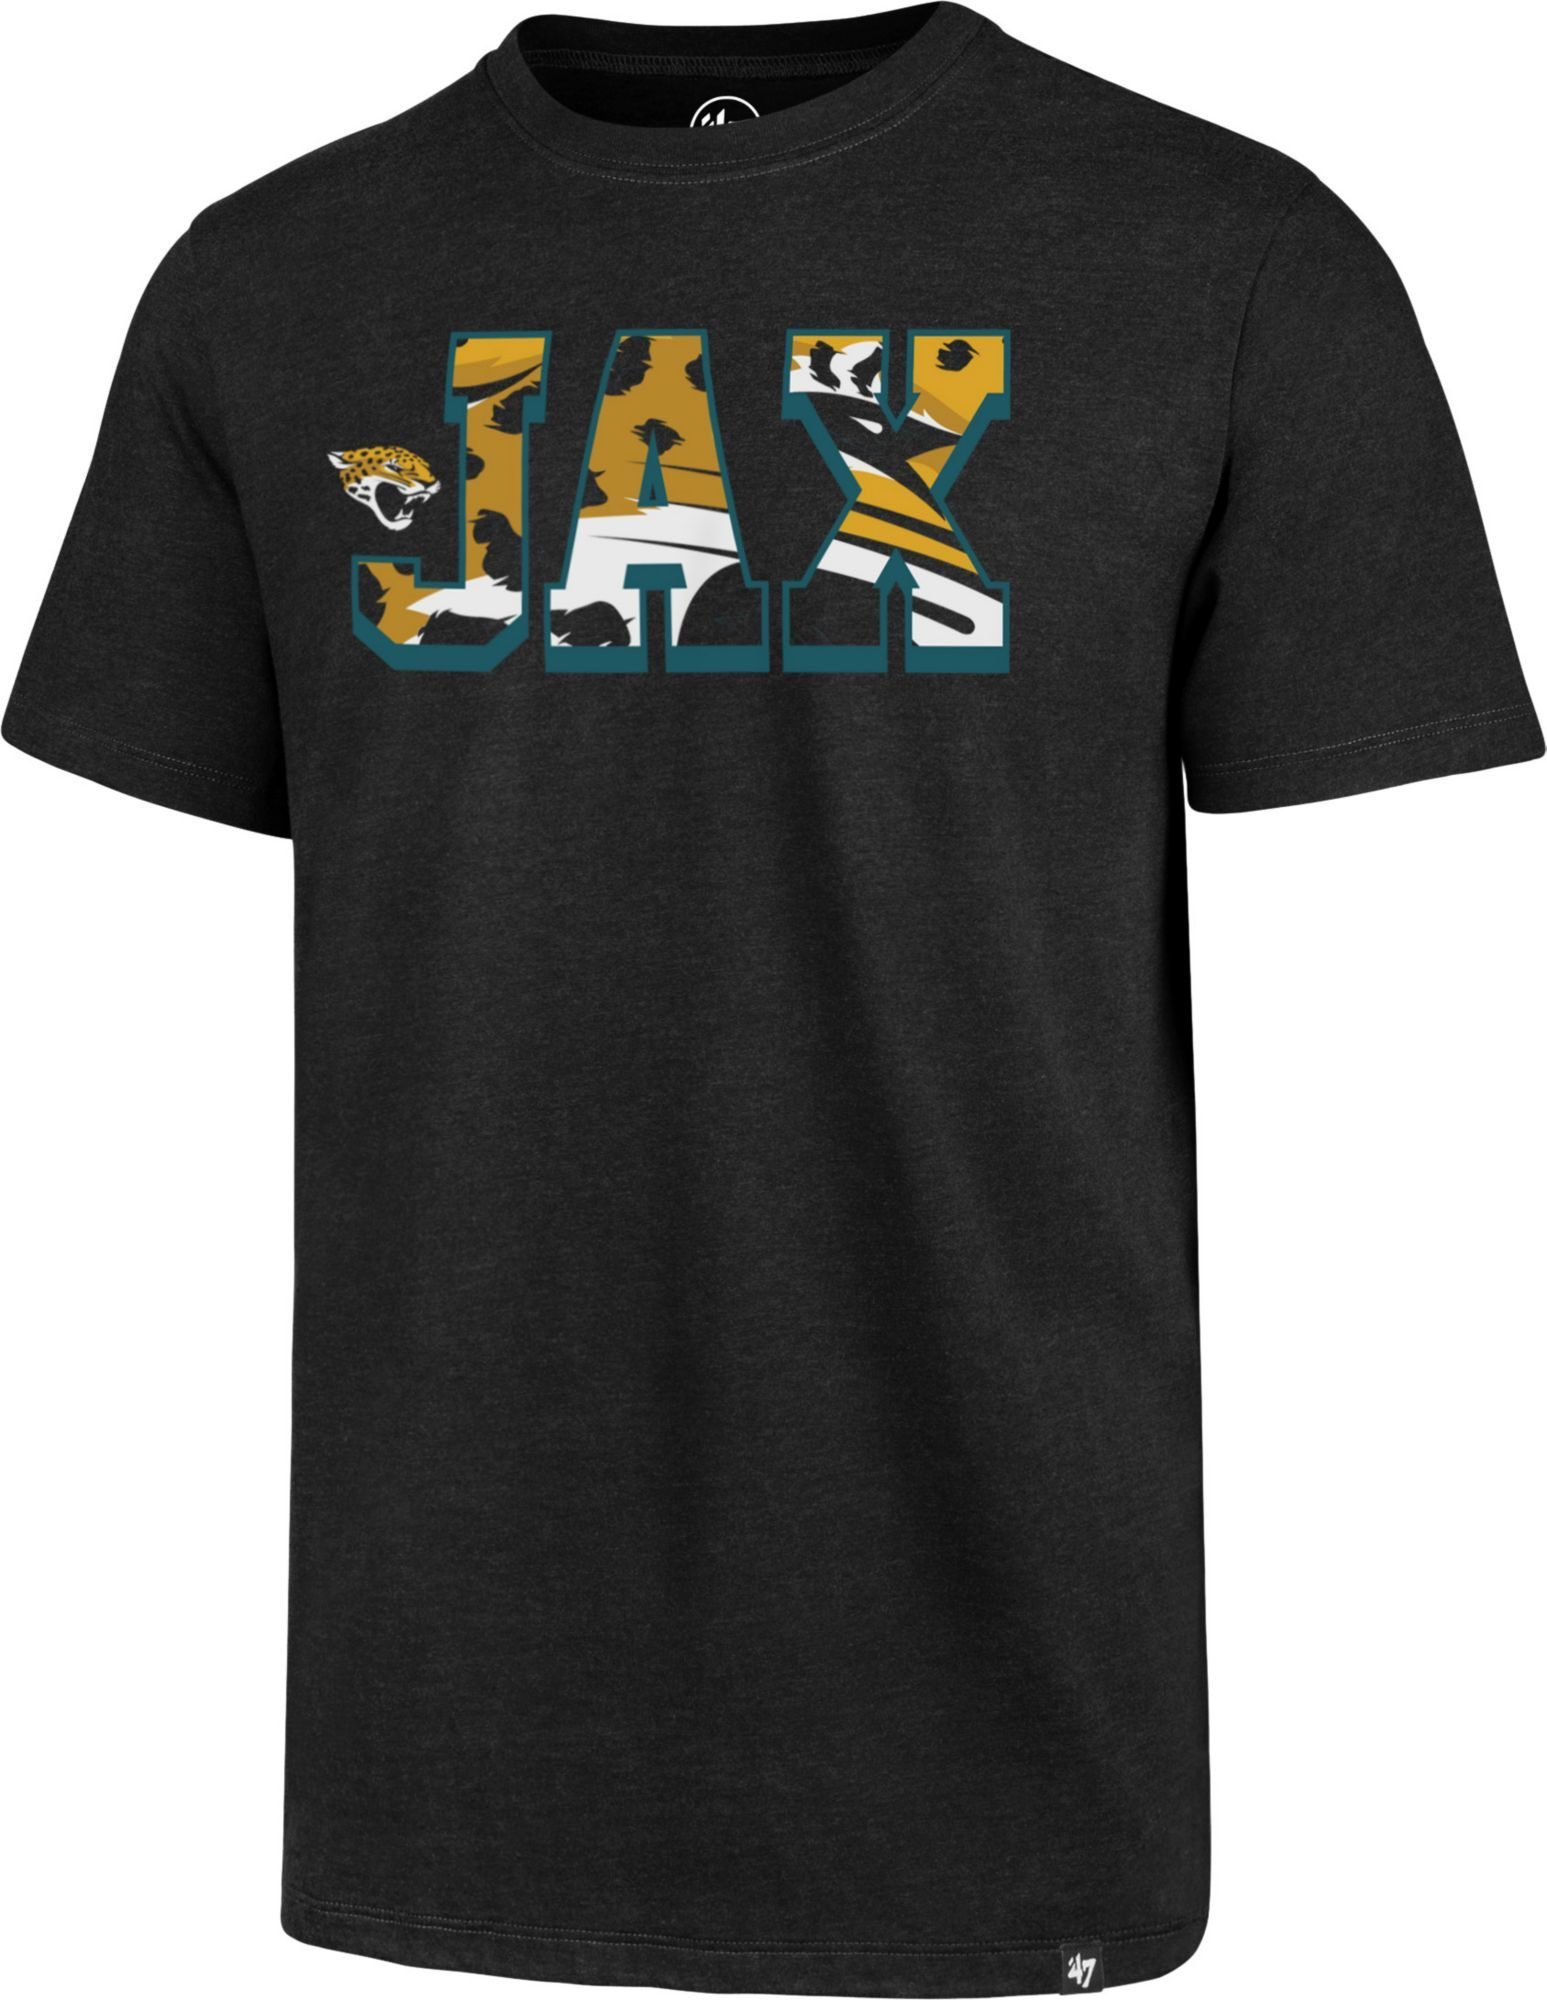 1717ede5 '47 Men's Jacksonville JAX Black T-Shirt, Size: Medium in 2019 ...